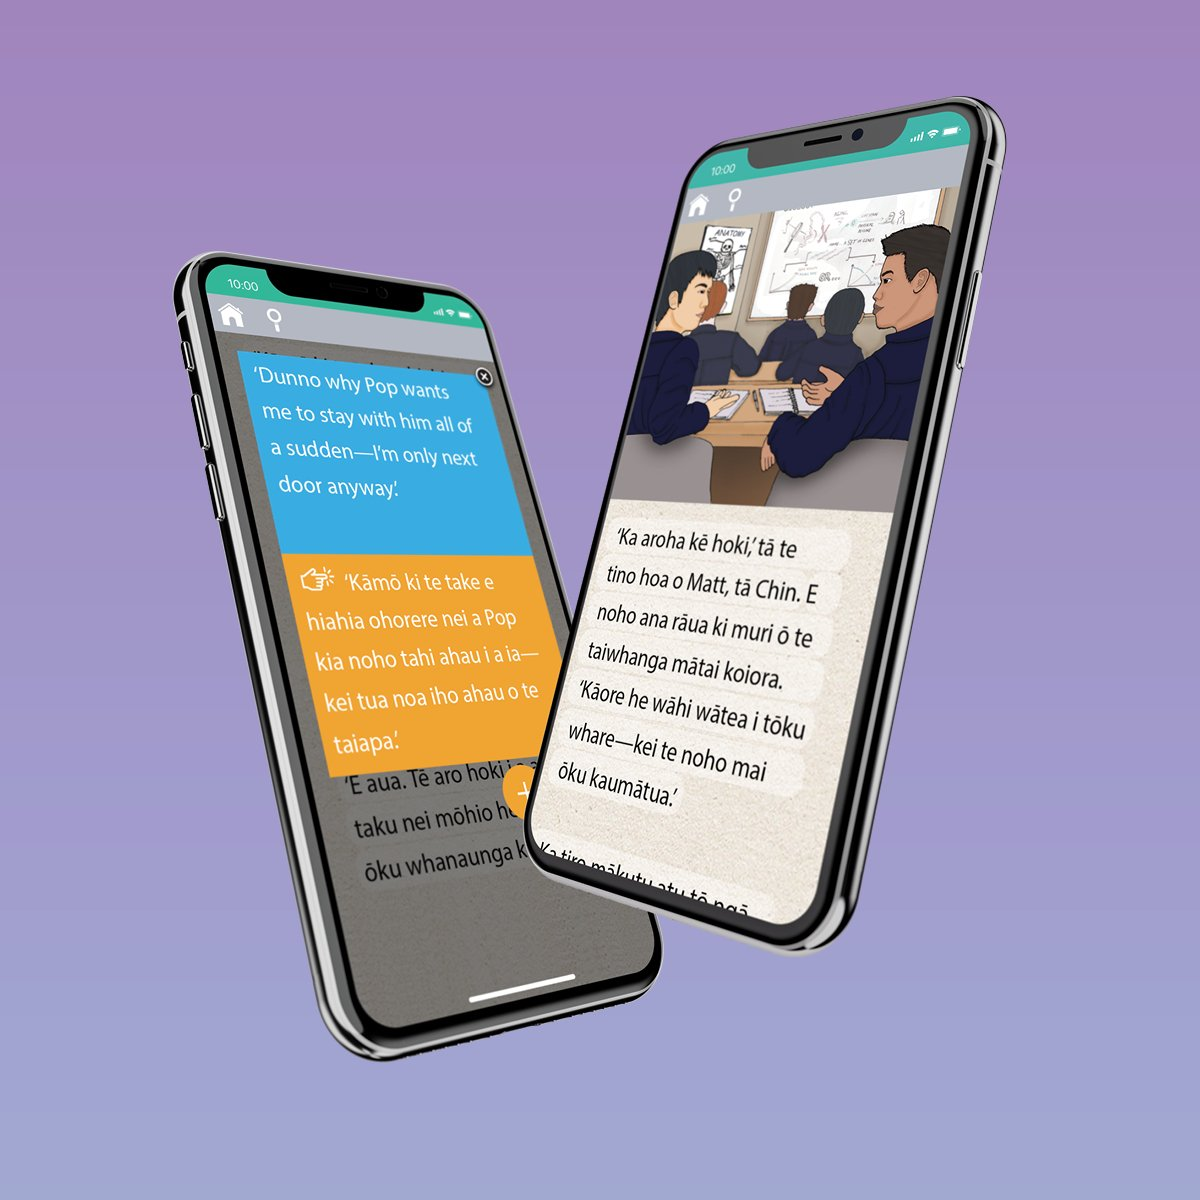 Lingogo-Libraries-DigitalAssets-1200x12004